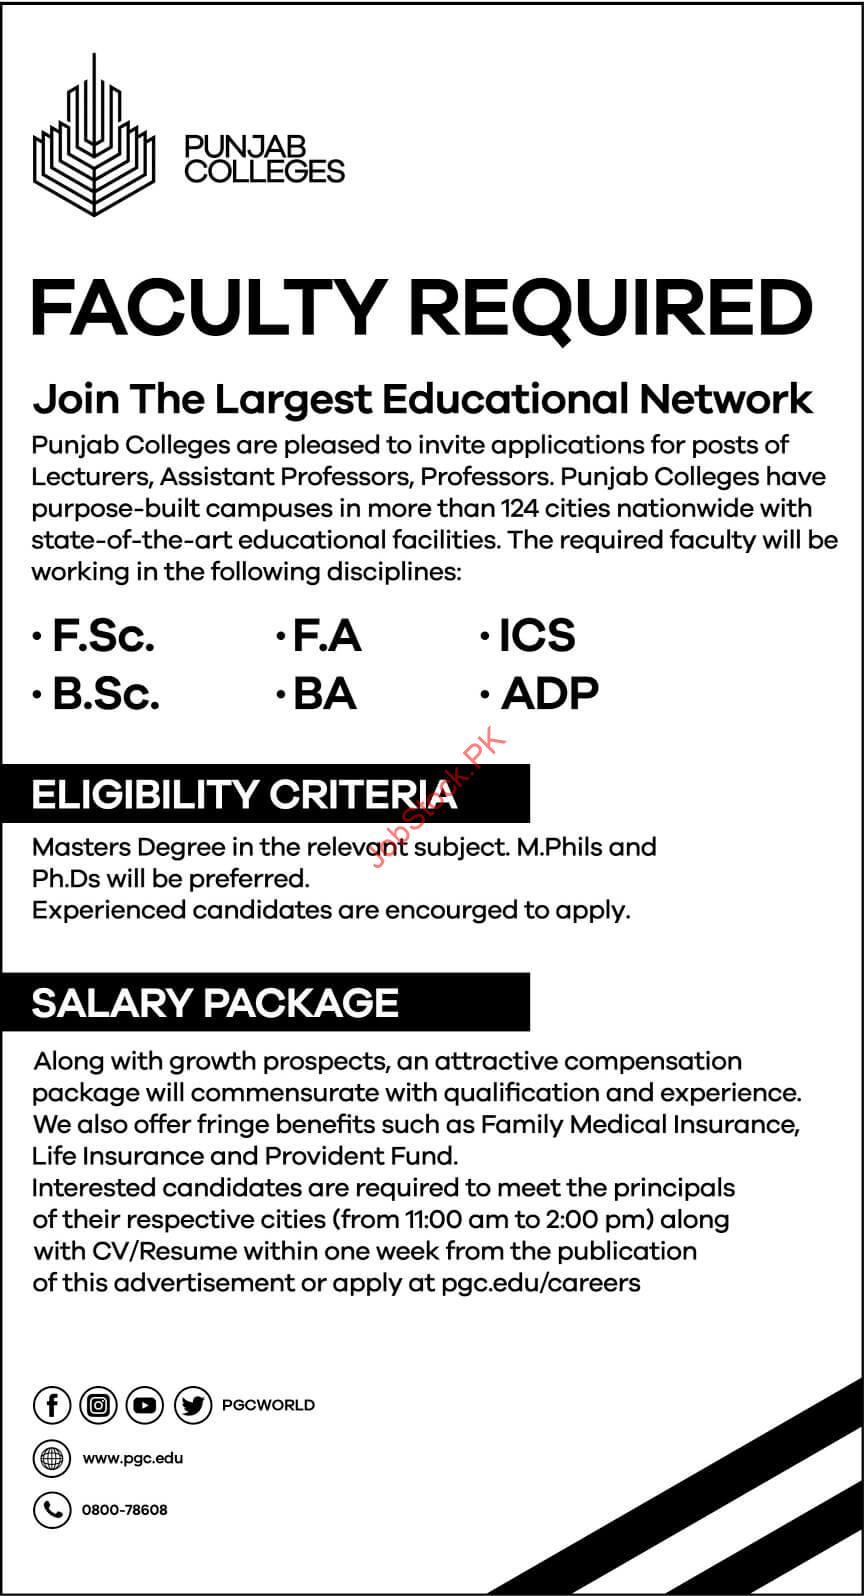 Pgc.edu.pk Careers